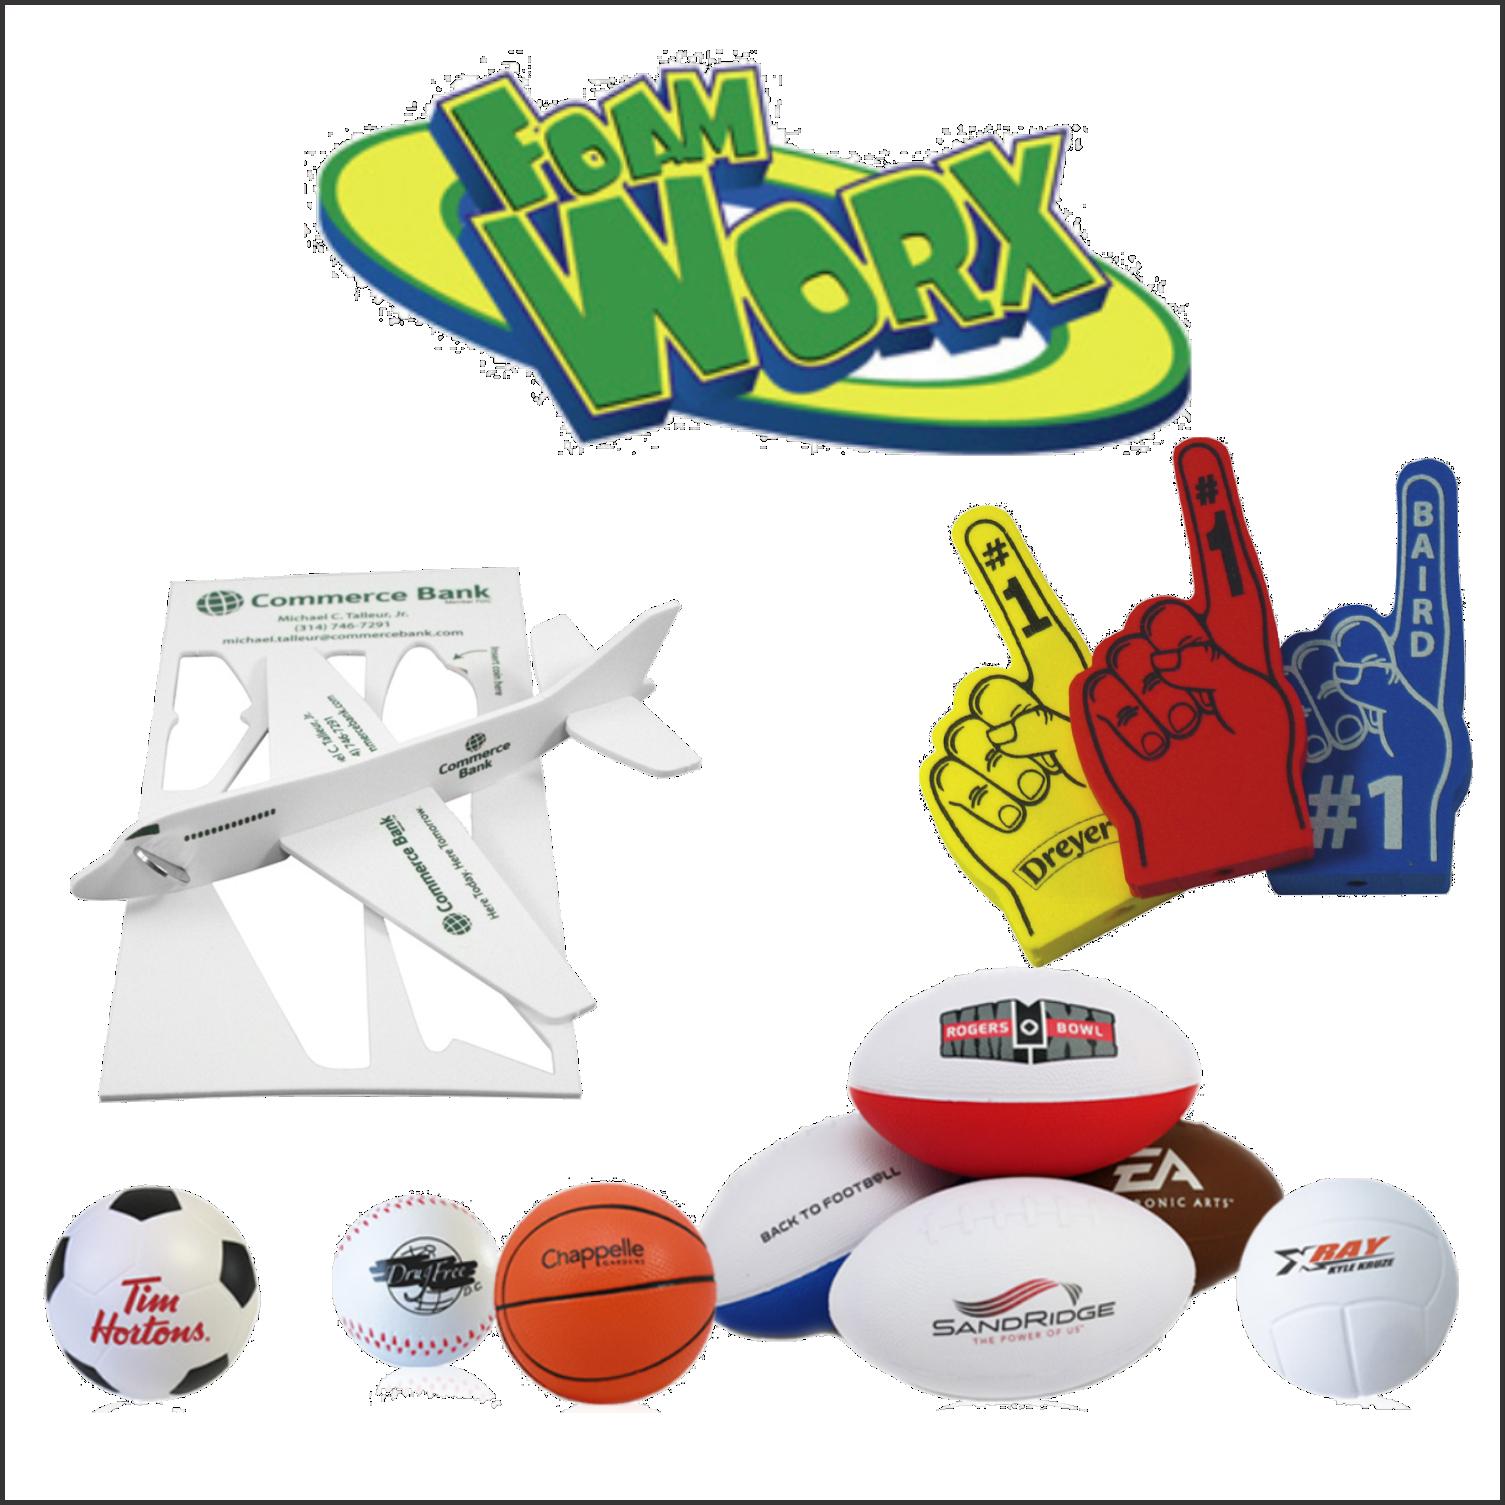 Foam Worxs Button.png